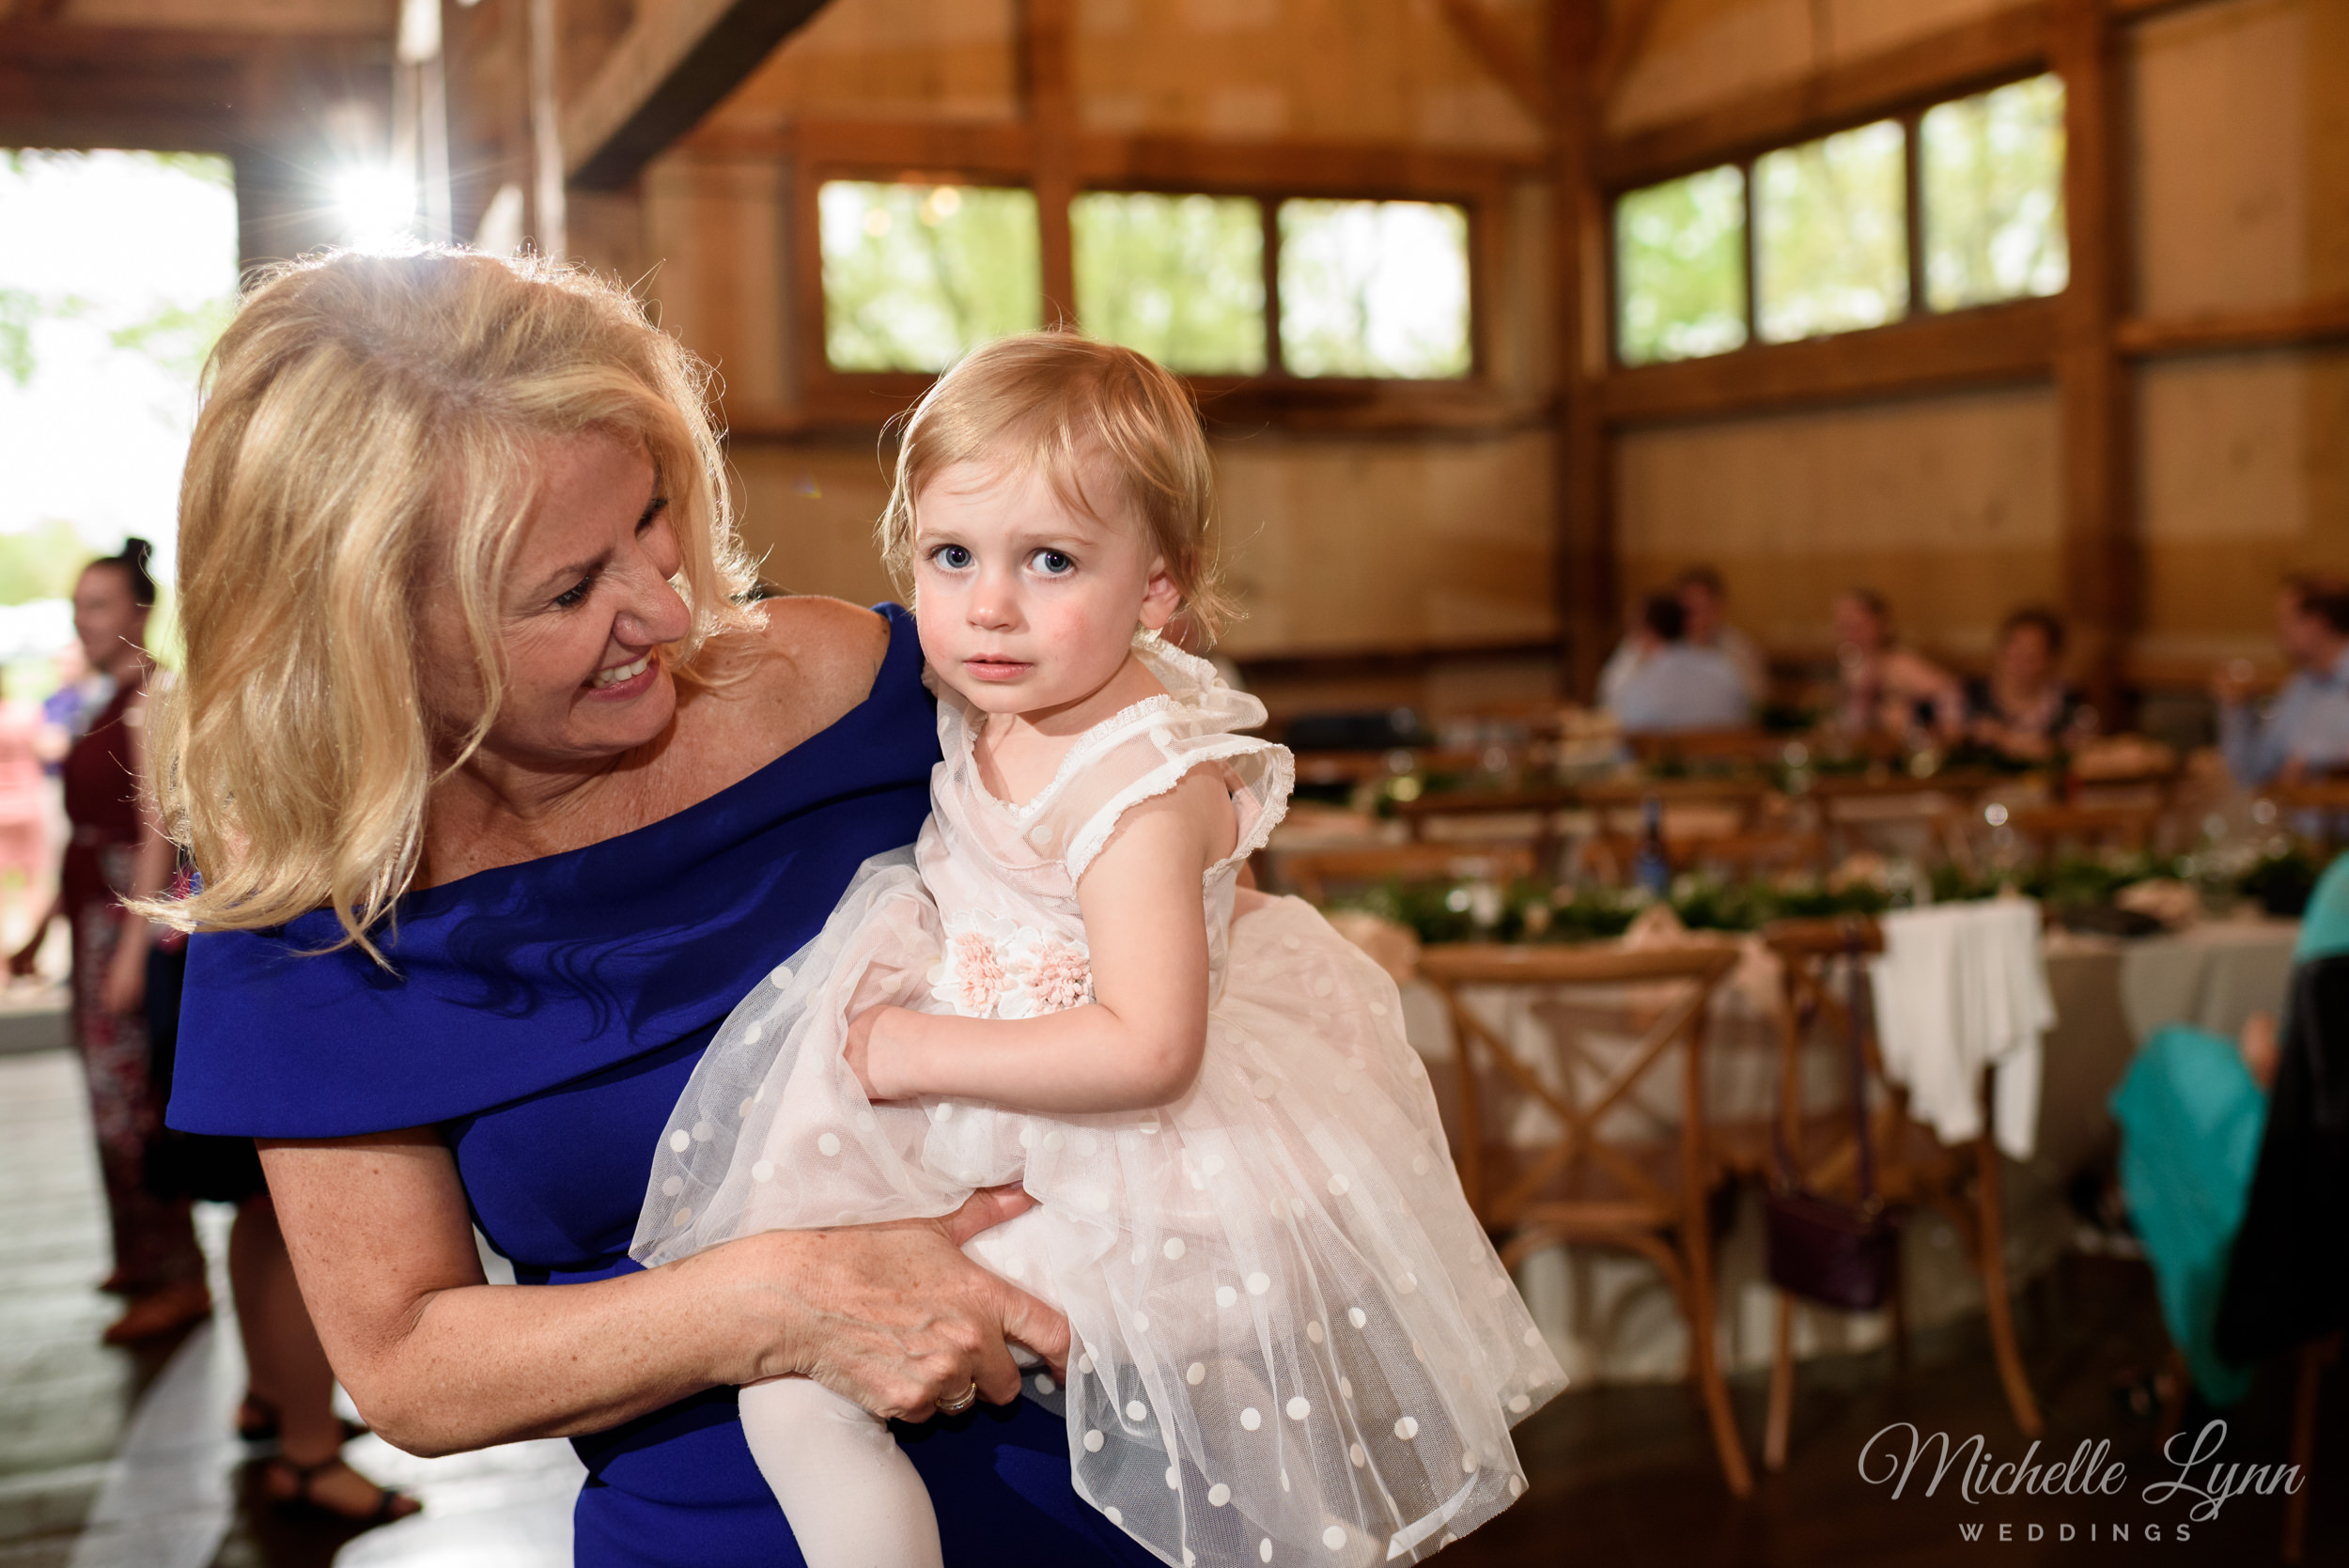 mlw-the-farm-bakery-and-events-wedding-photos-74.jpg